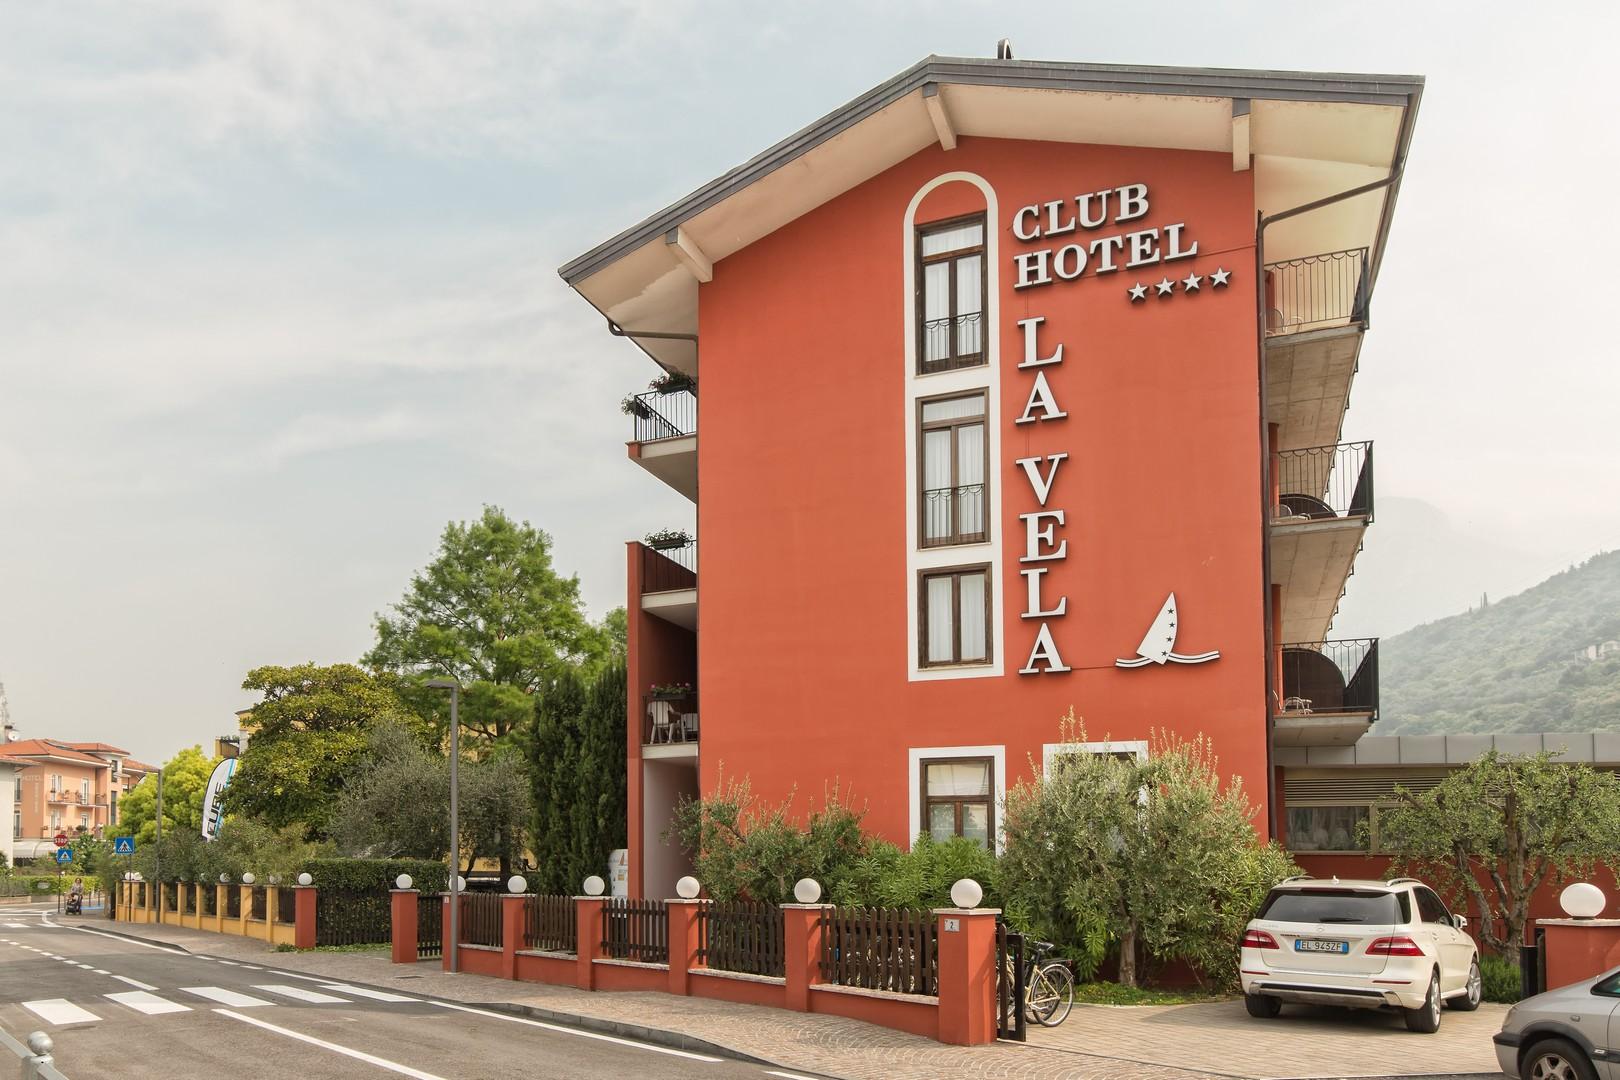 Hotel La Vela Torbole